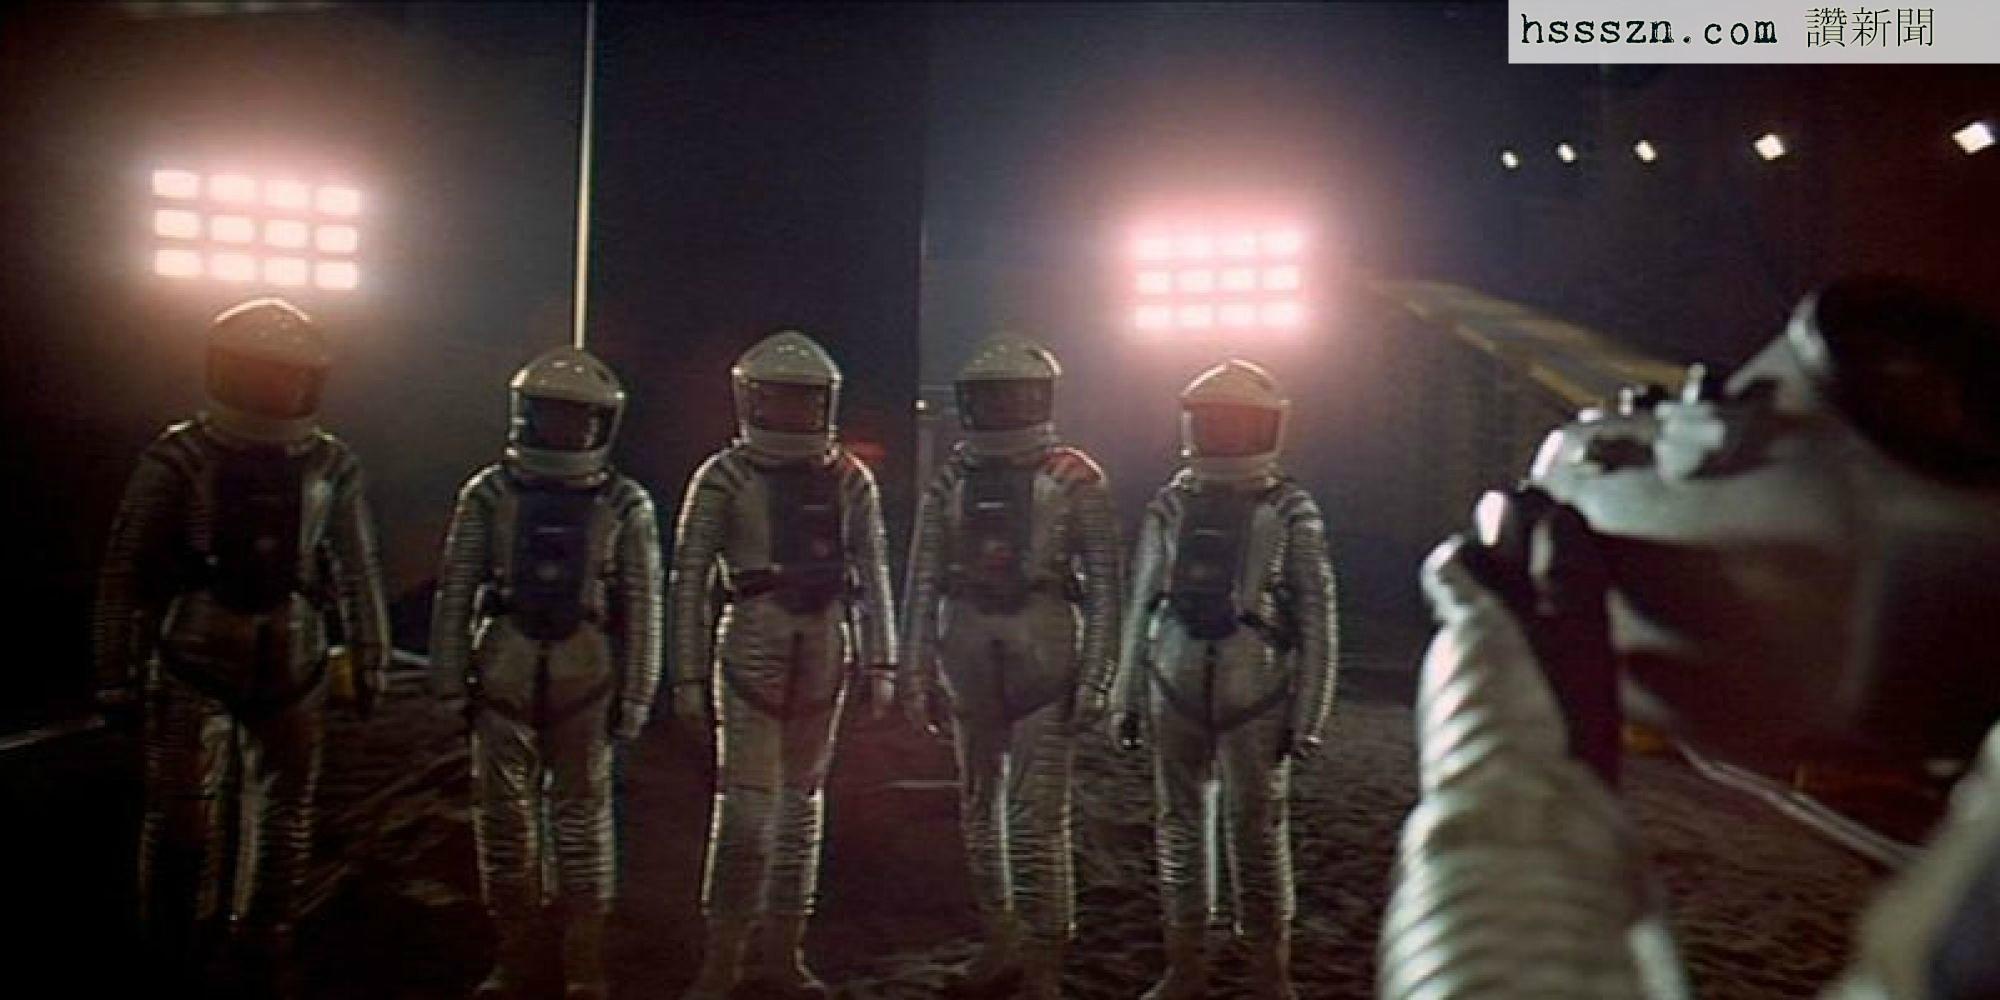 o-2001-SPACE-ODYSSEY-facebook